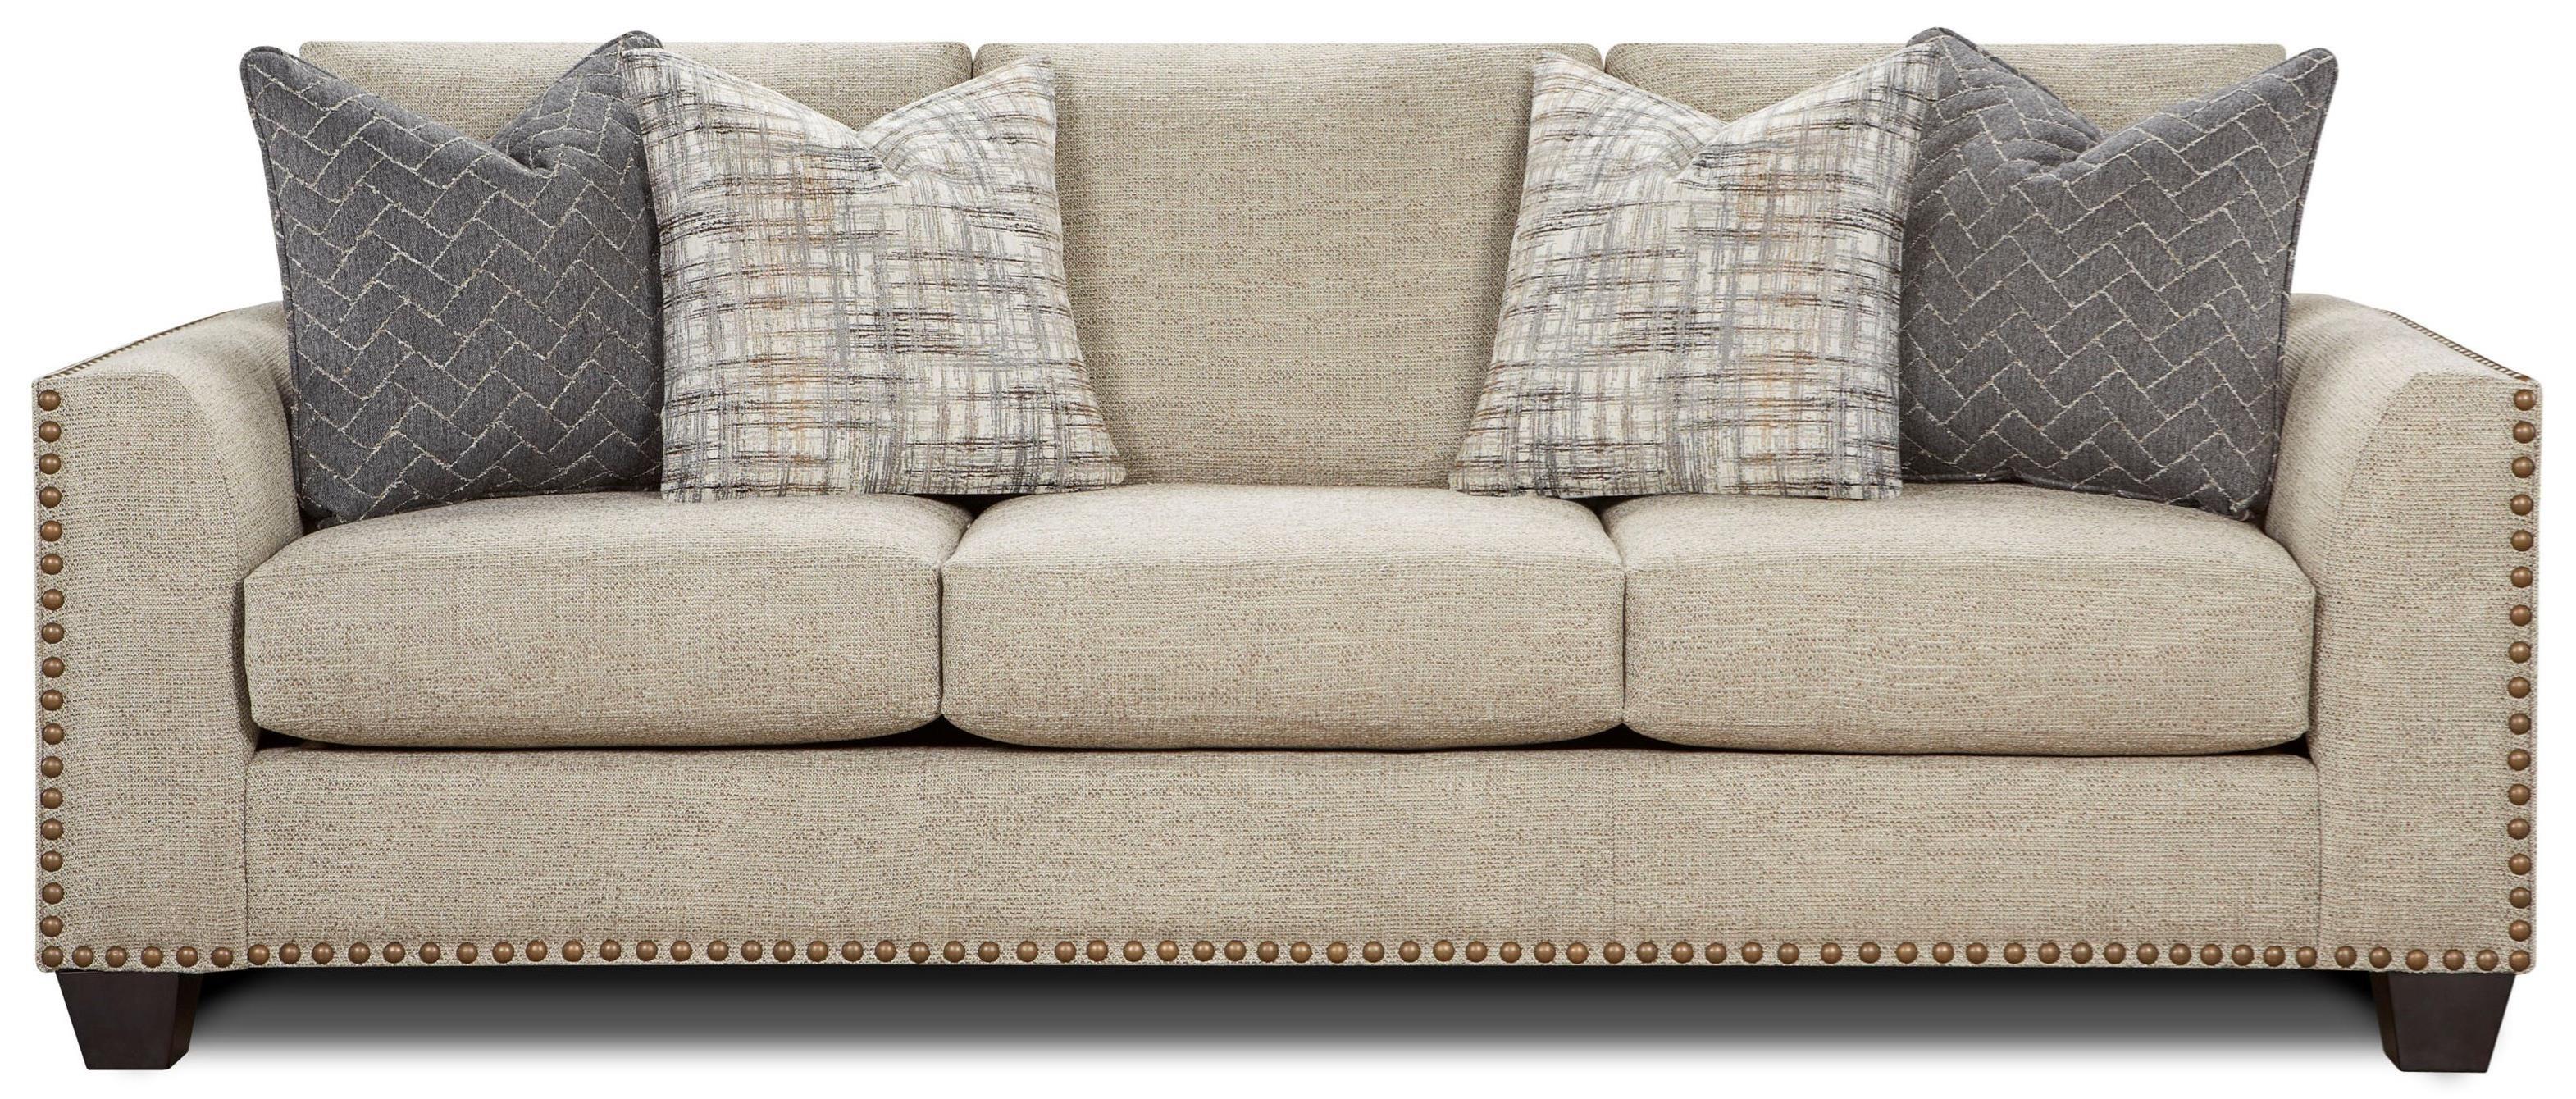 VFM Signature 1430 Sofa - Item Number: 1430Tailormade Cafe